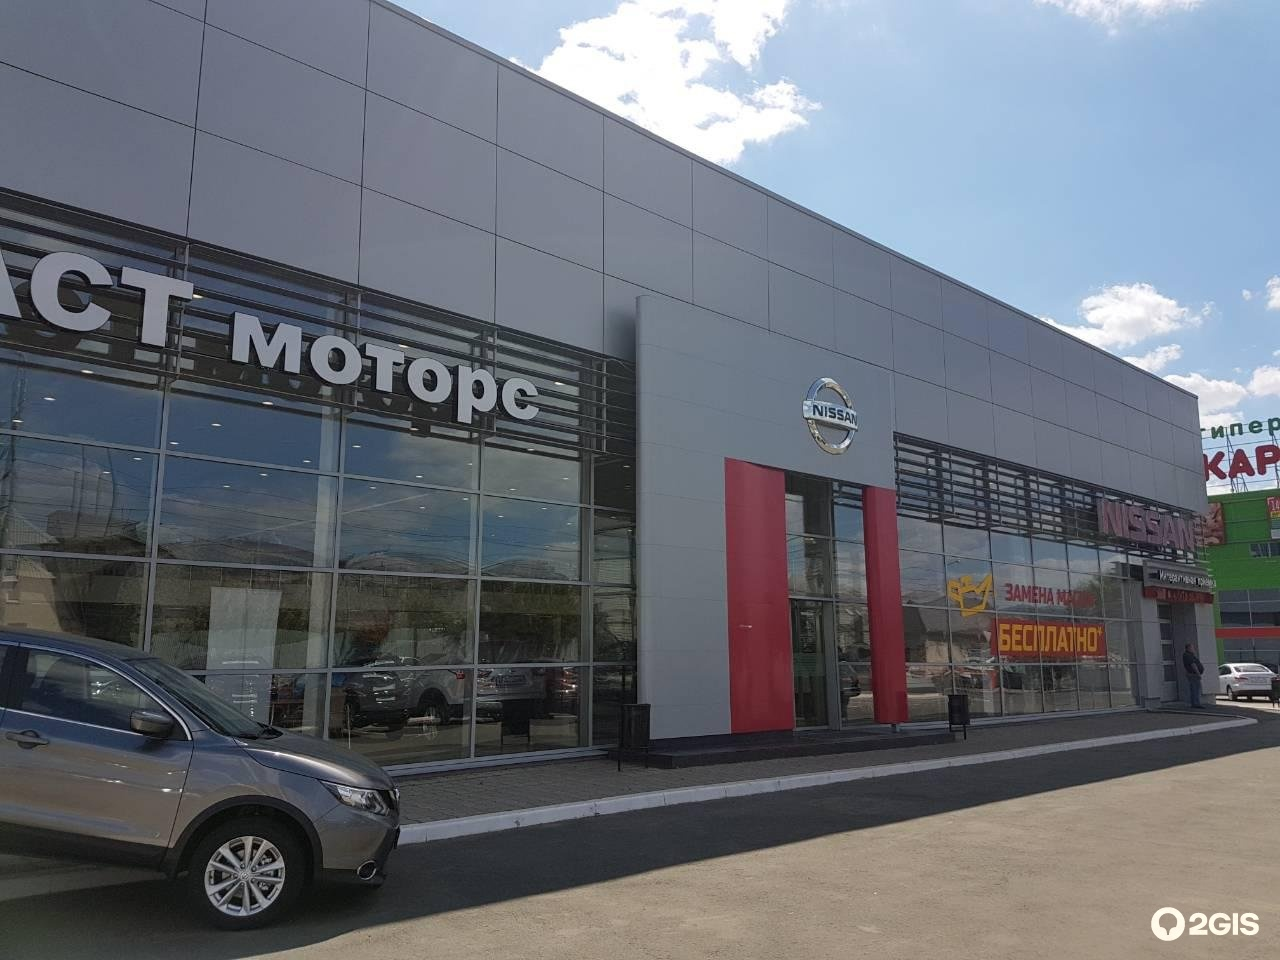 Аст моторс автосалон москва отзывы о автосалоне олимп в москве